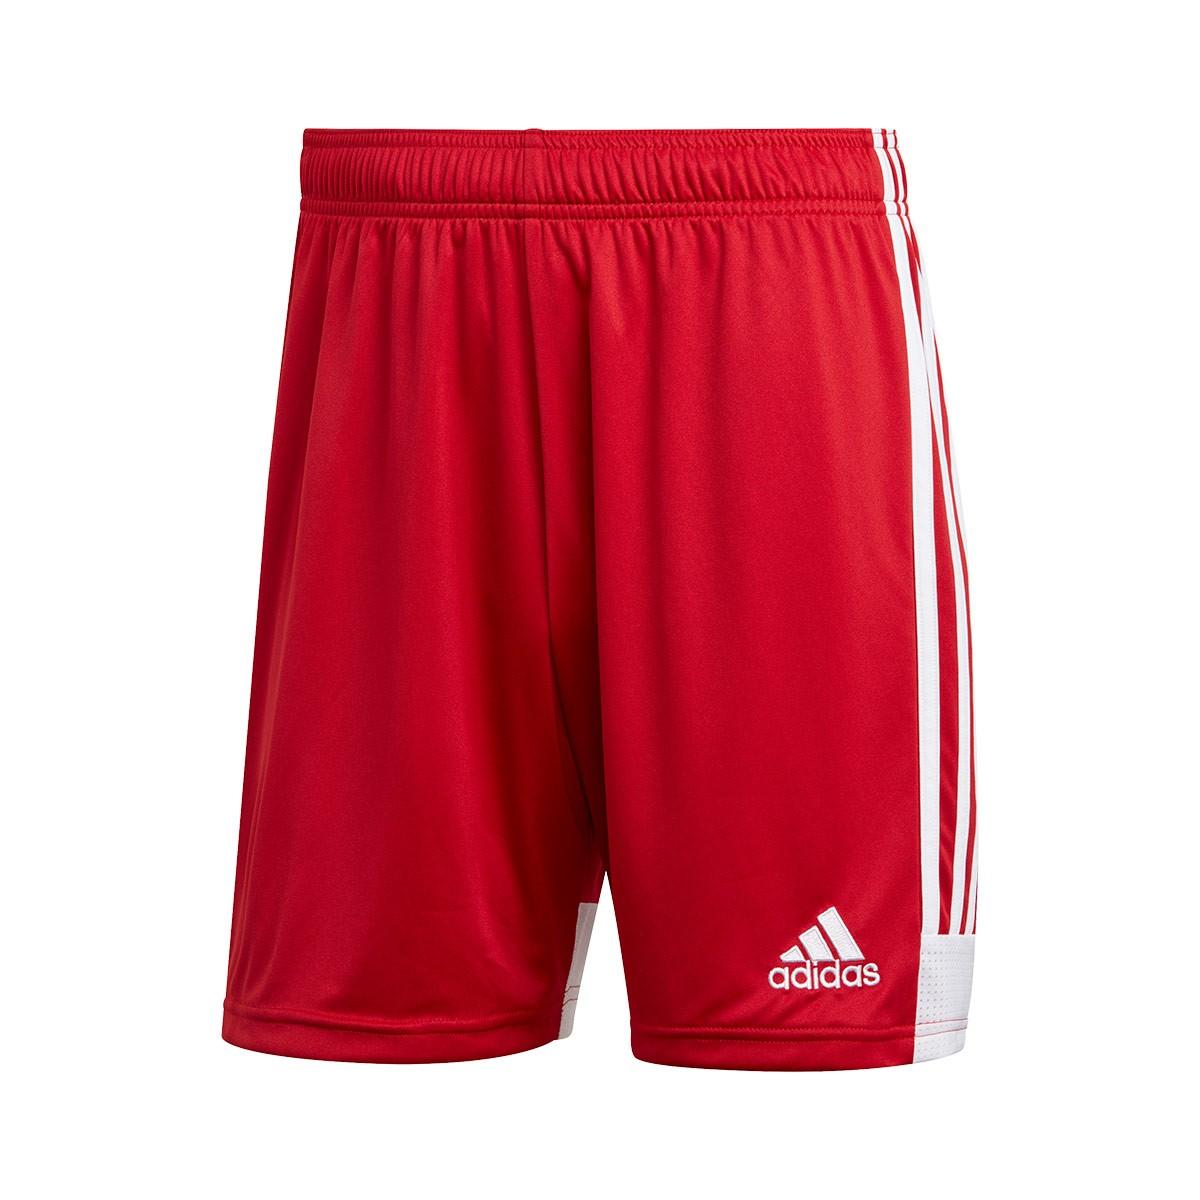 short adidas red